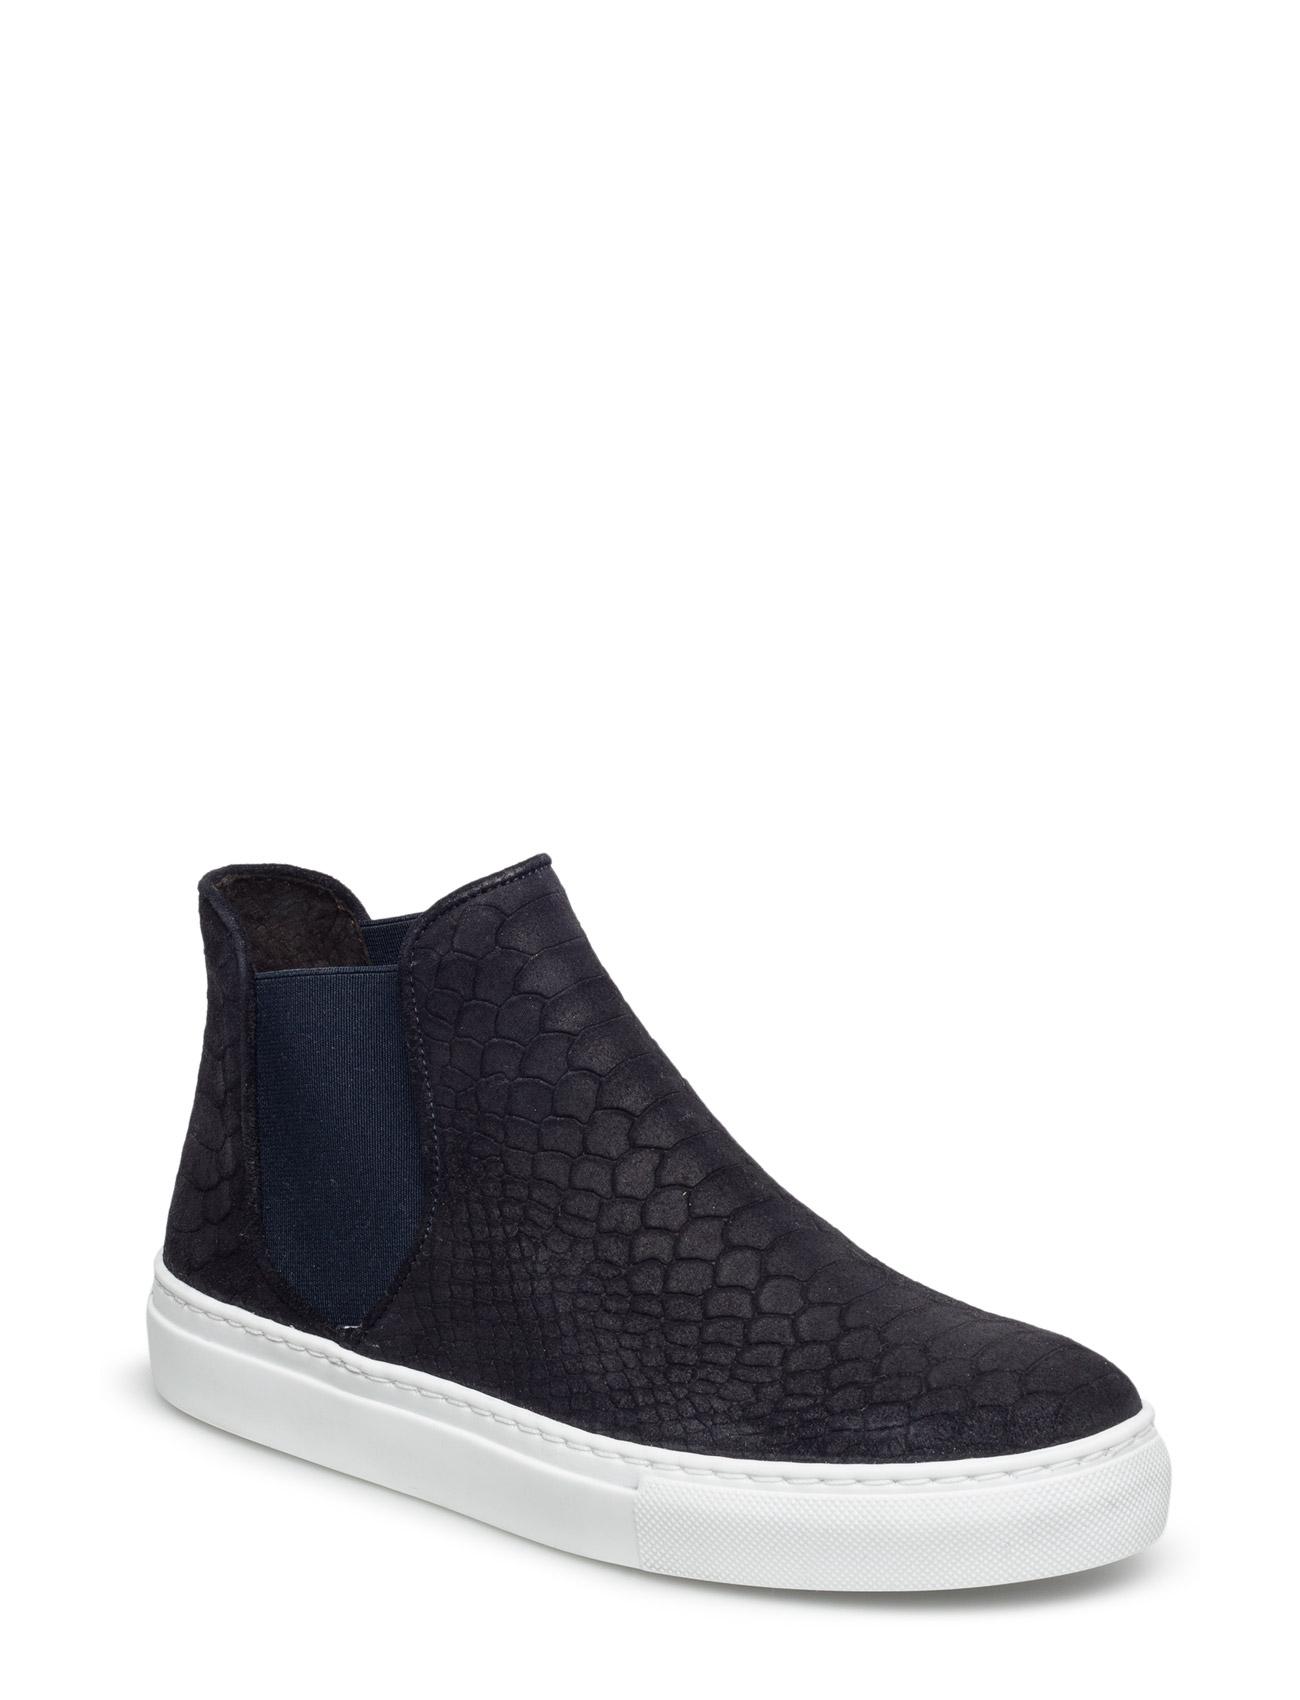 Shoes fra carla f fra boozt.com dk